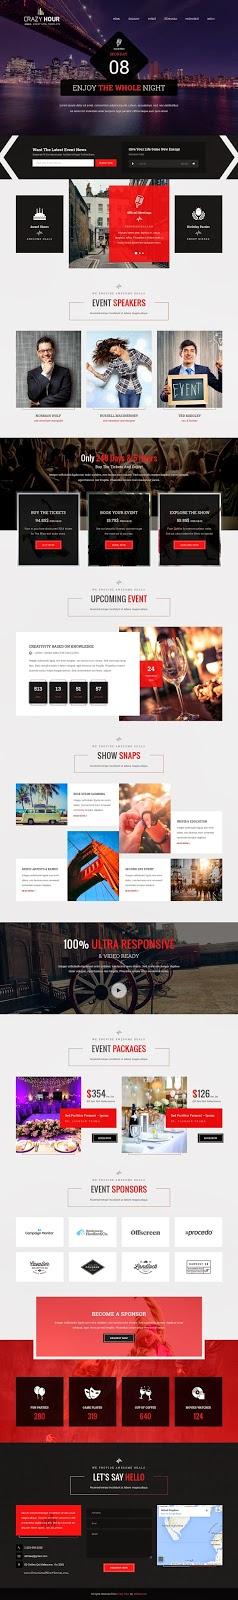 Crazy Hour Best Event Management HTML Template   Web design ...